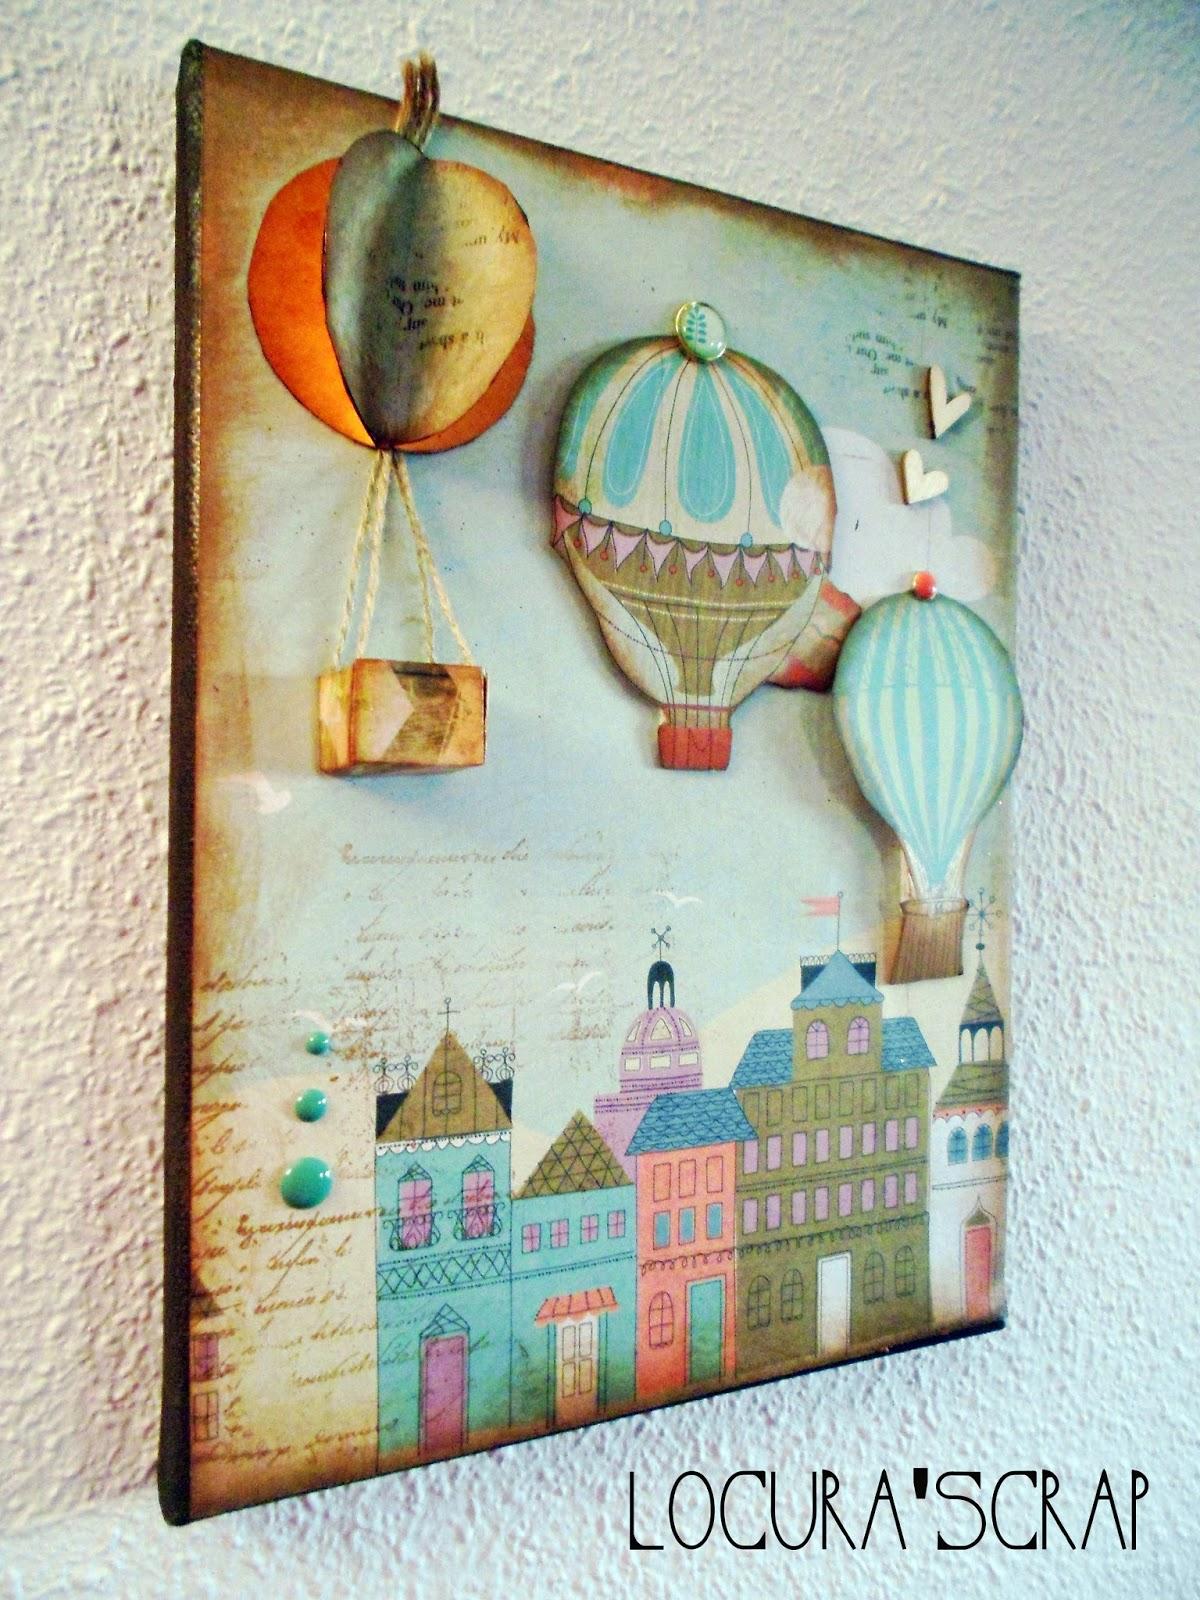 How to scrapbook canvas - Decirme Vuestra Opini N Que Pas Is Un Buen Fin De Semana Besotes